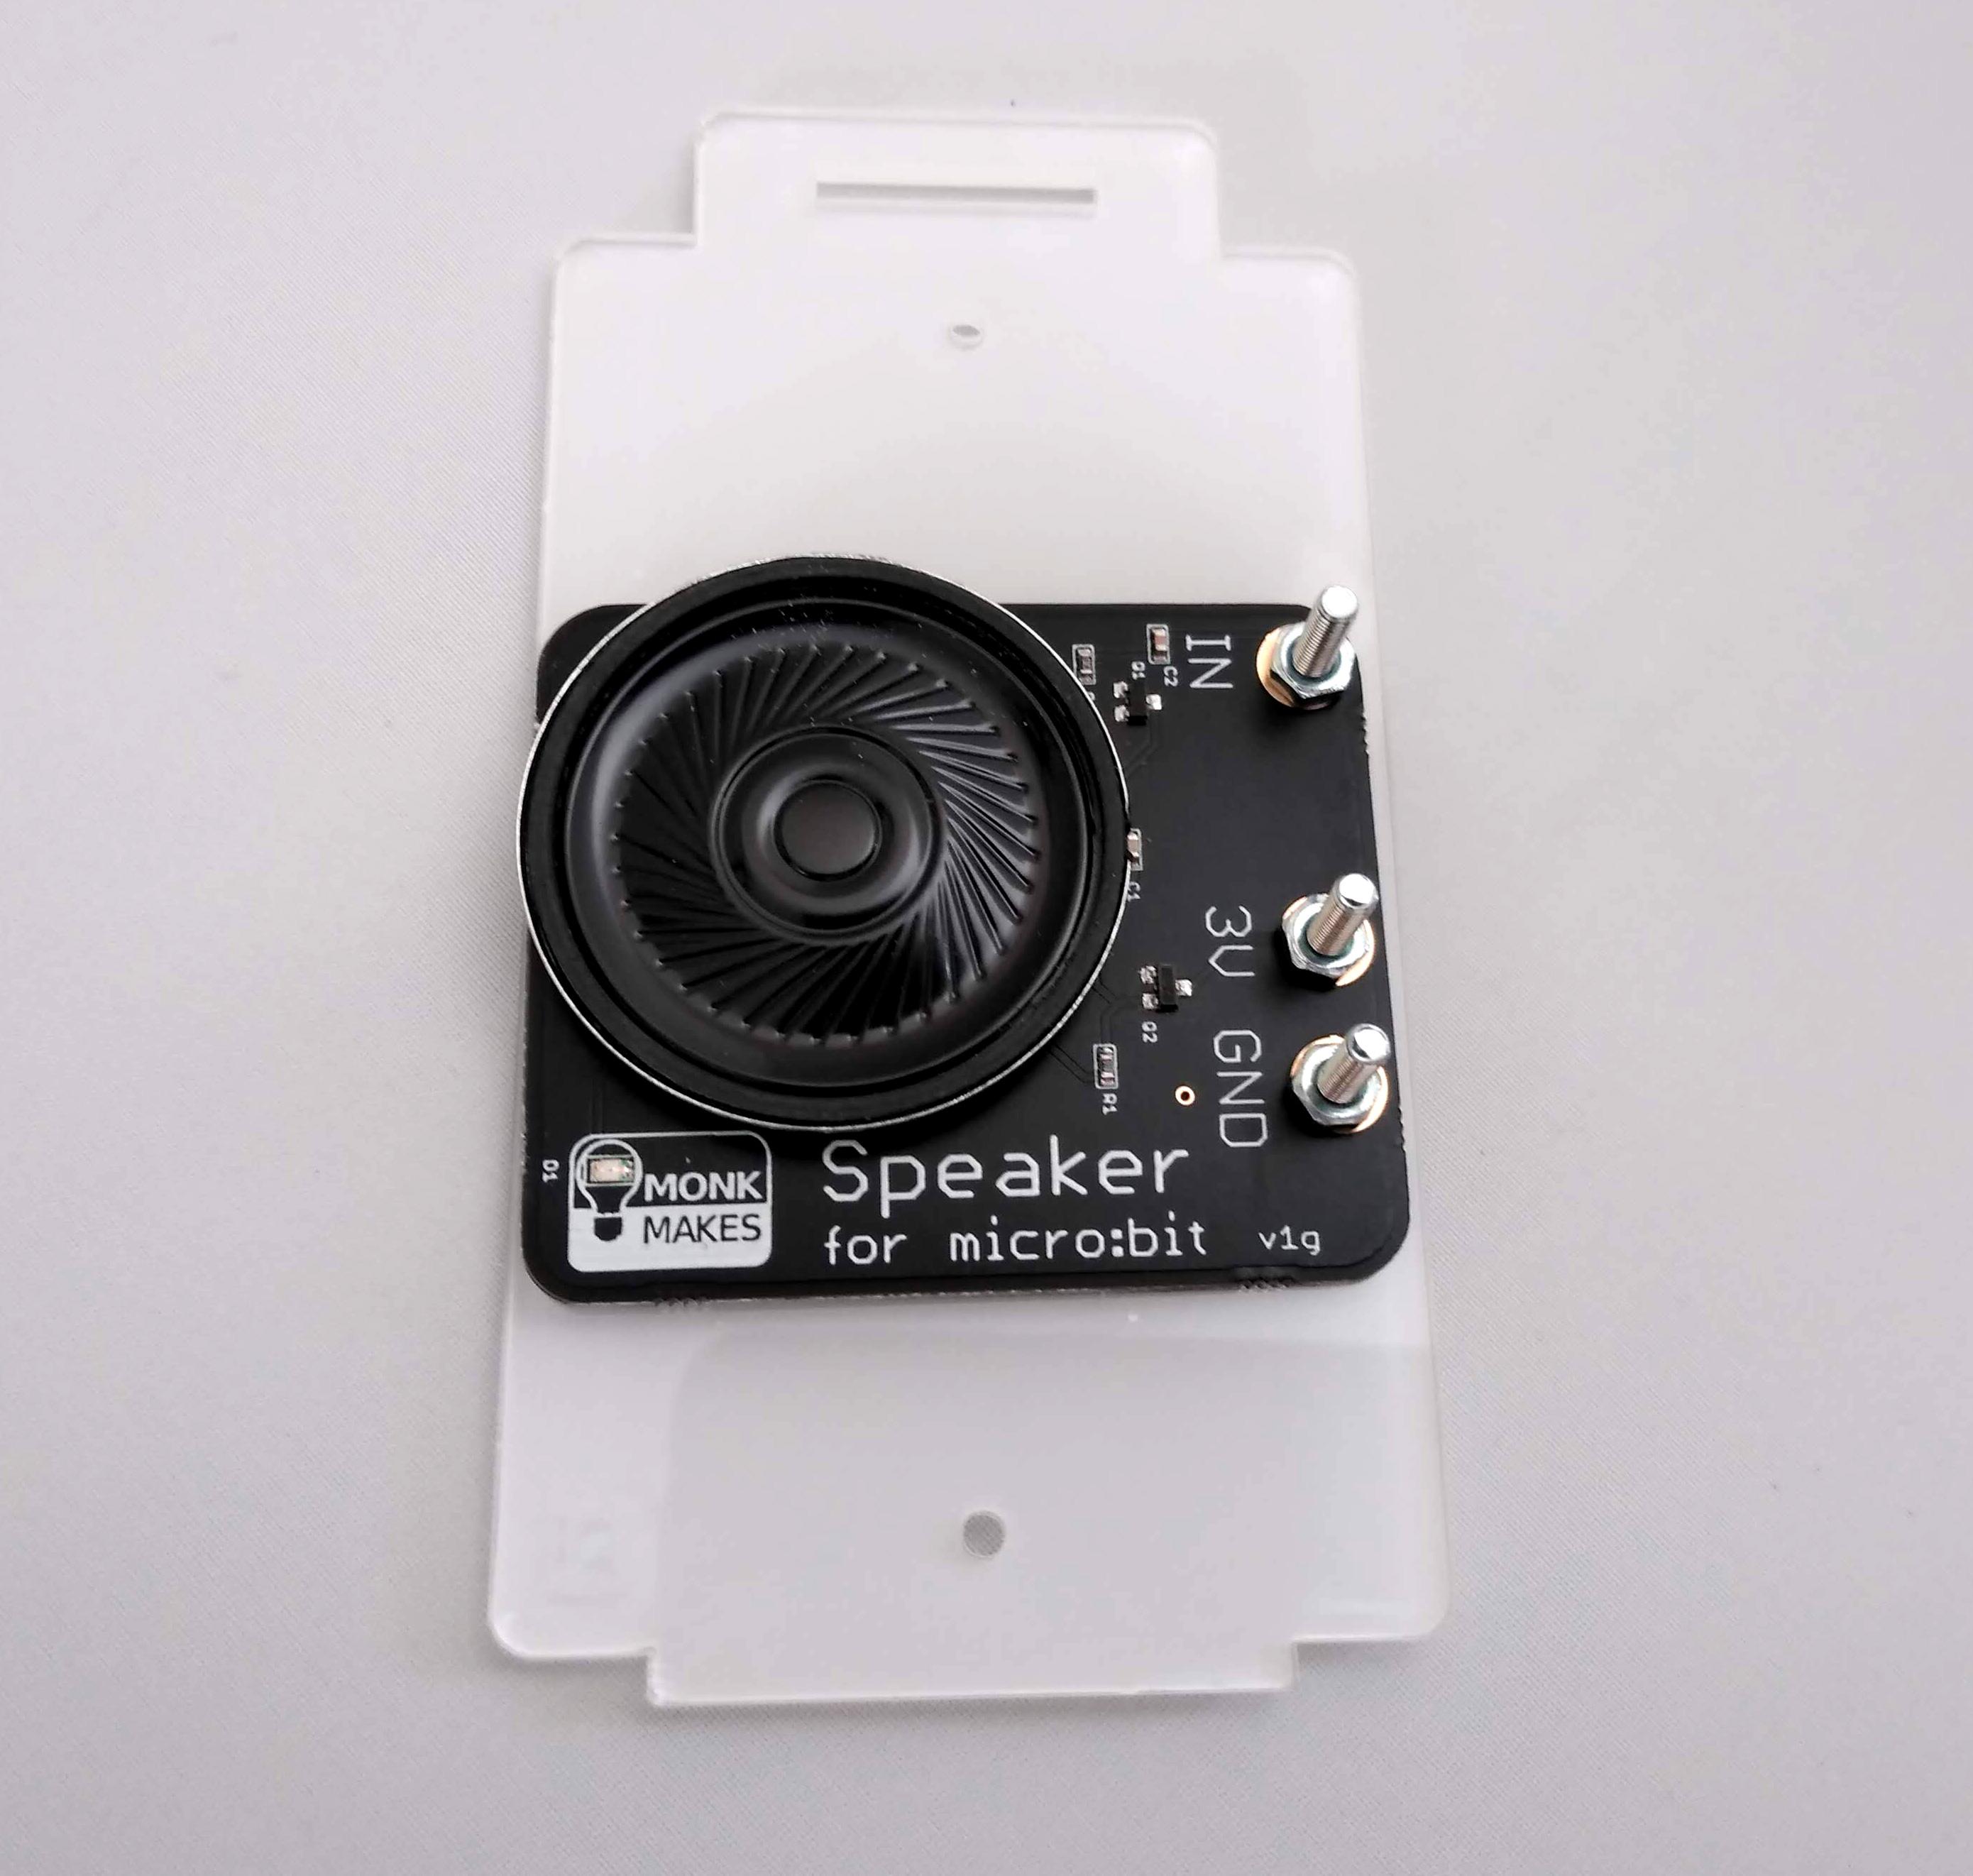 micro:bit speaker attached